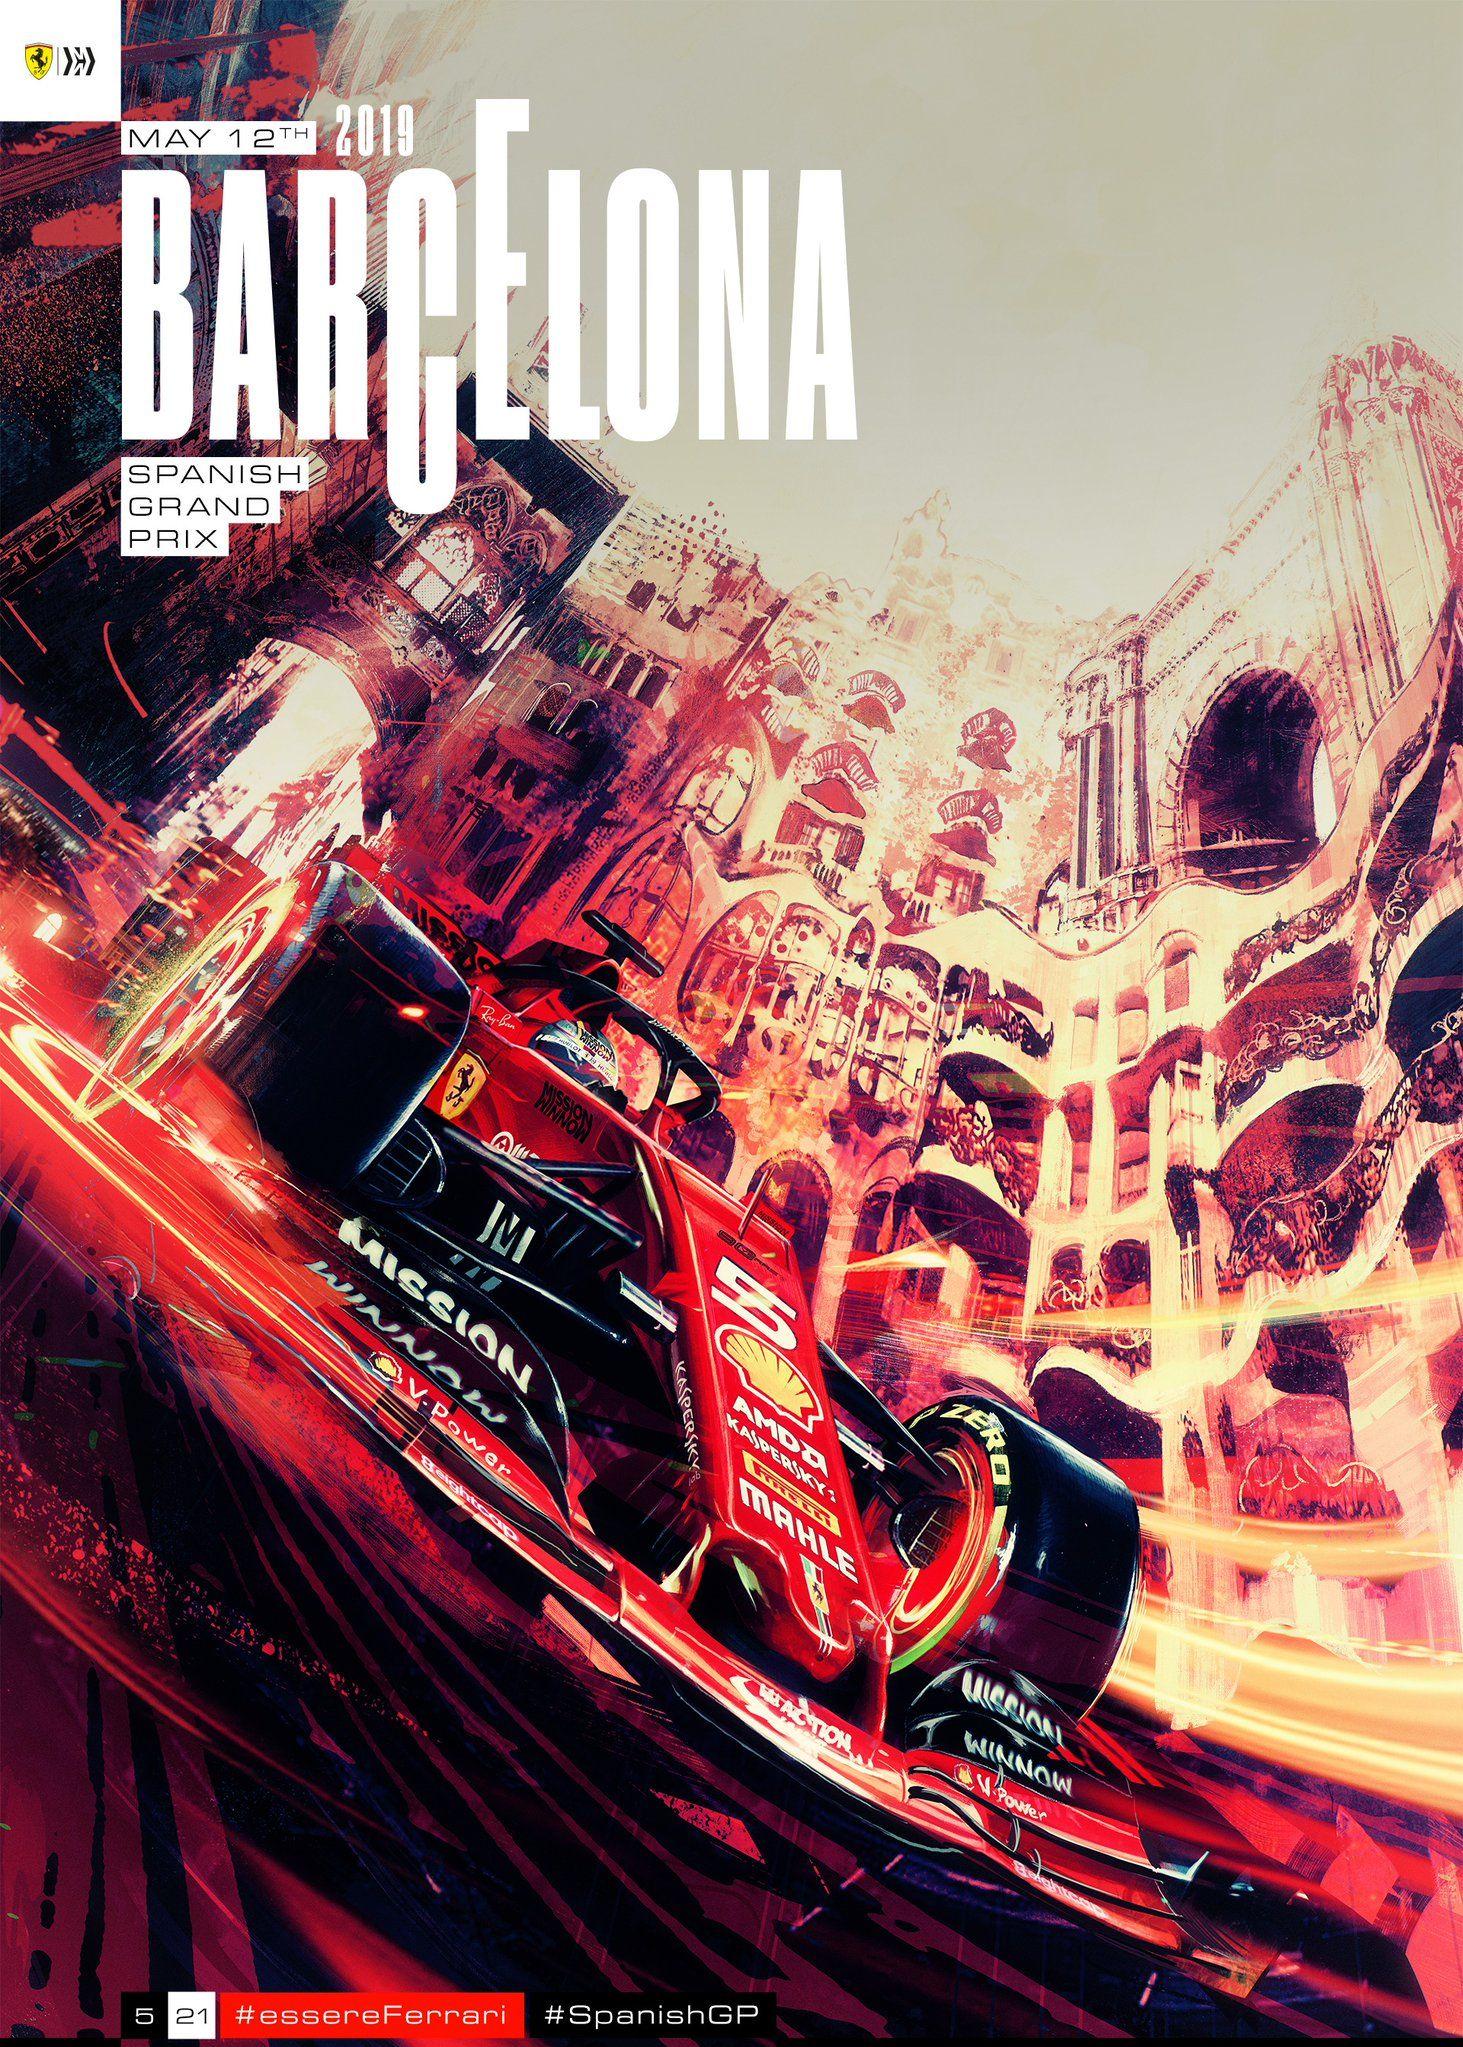 Sebastian Vettel P4 Charles Leclerc P5 Vintage Racing Poster Spanish Grand Prix Grand Prix Art